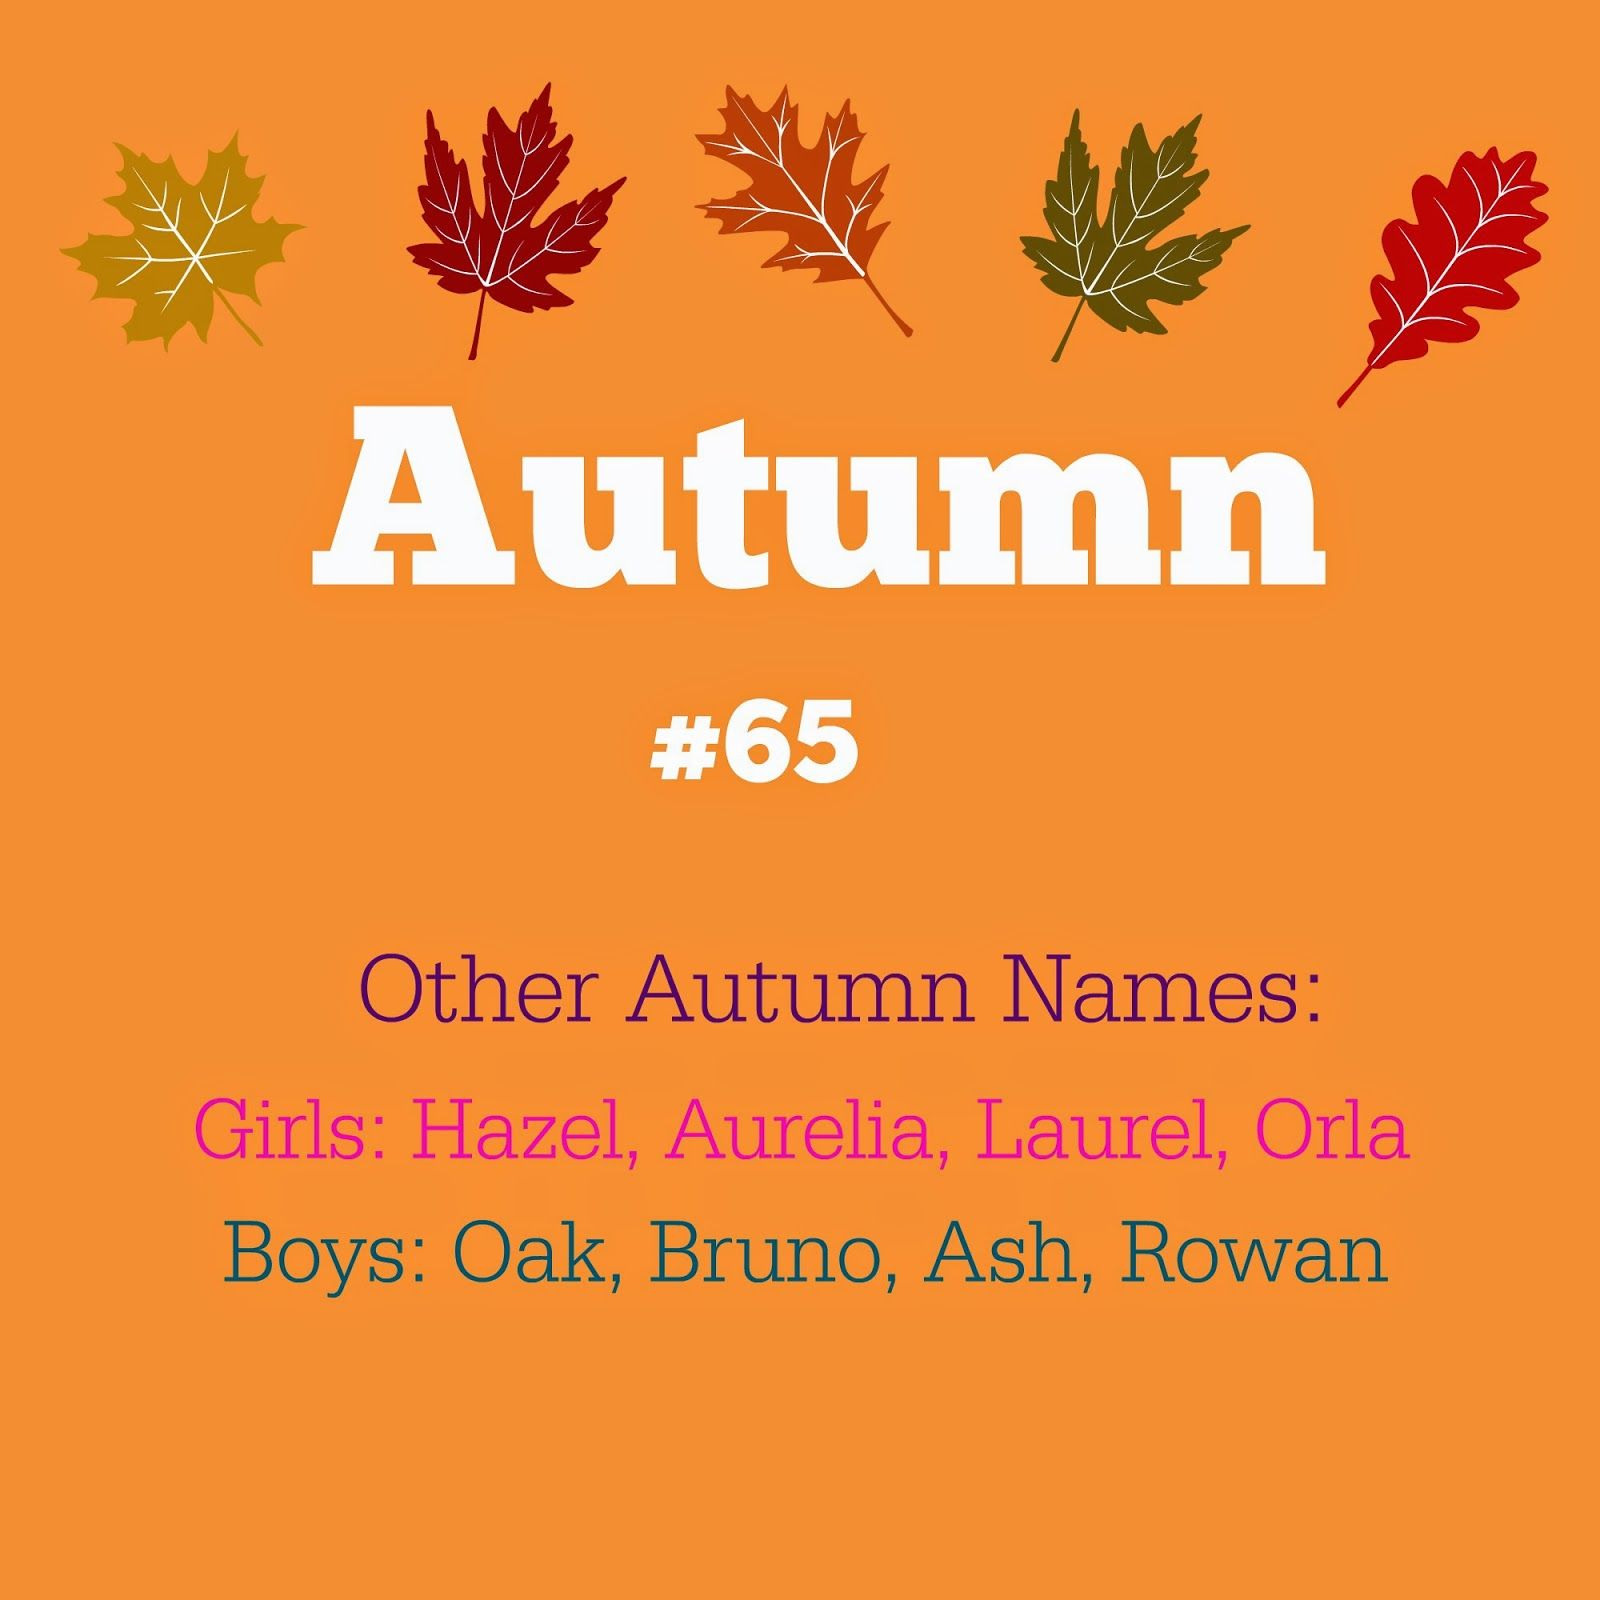 Calendar Names (month and season names): Autumn #65, my